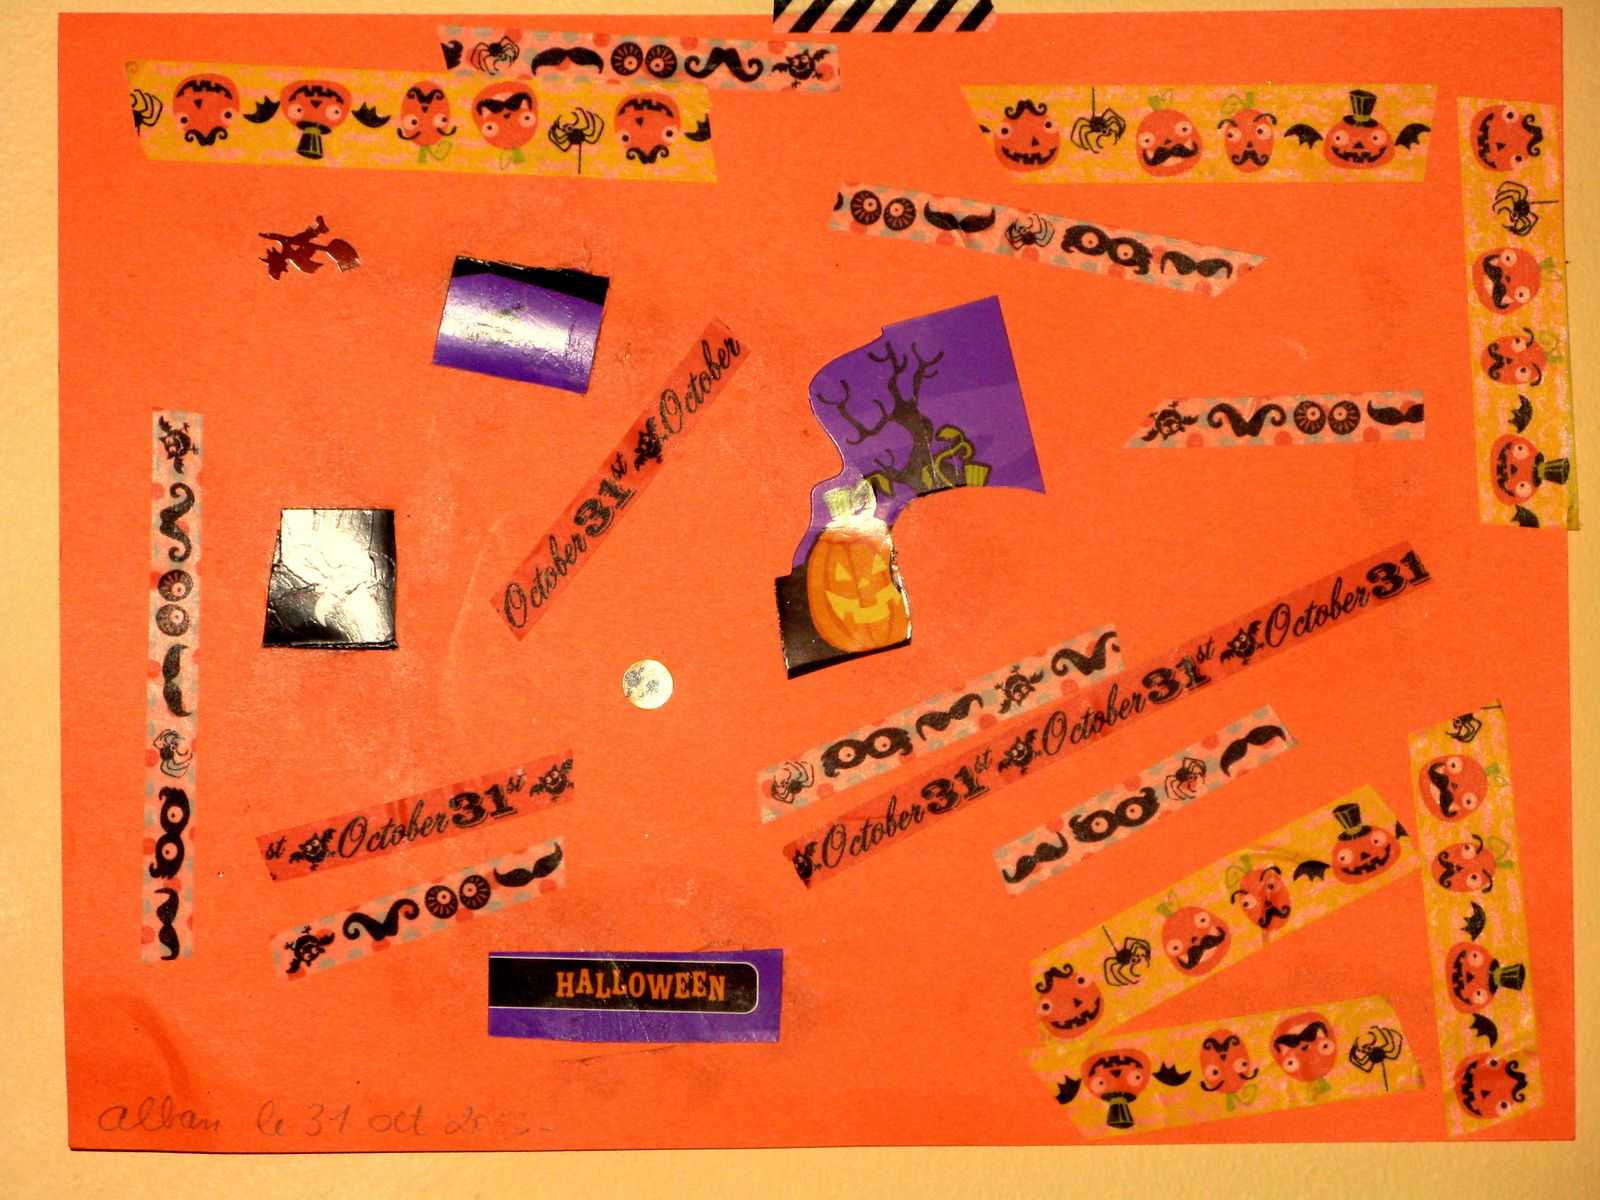 diy enfant dessins d'hallowenn sur charlotteblabla blog*